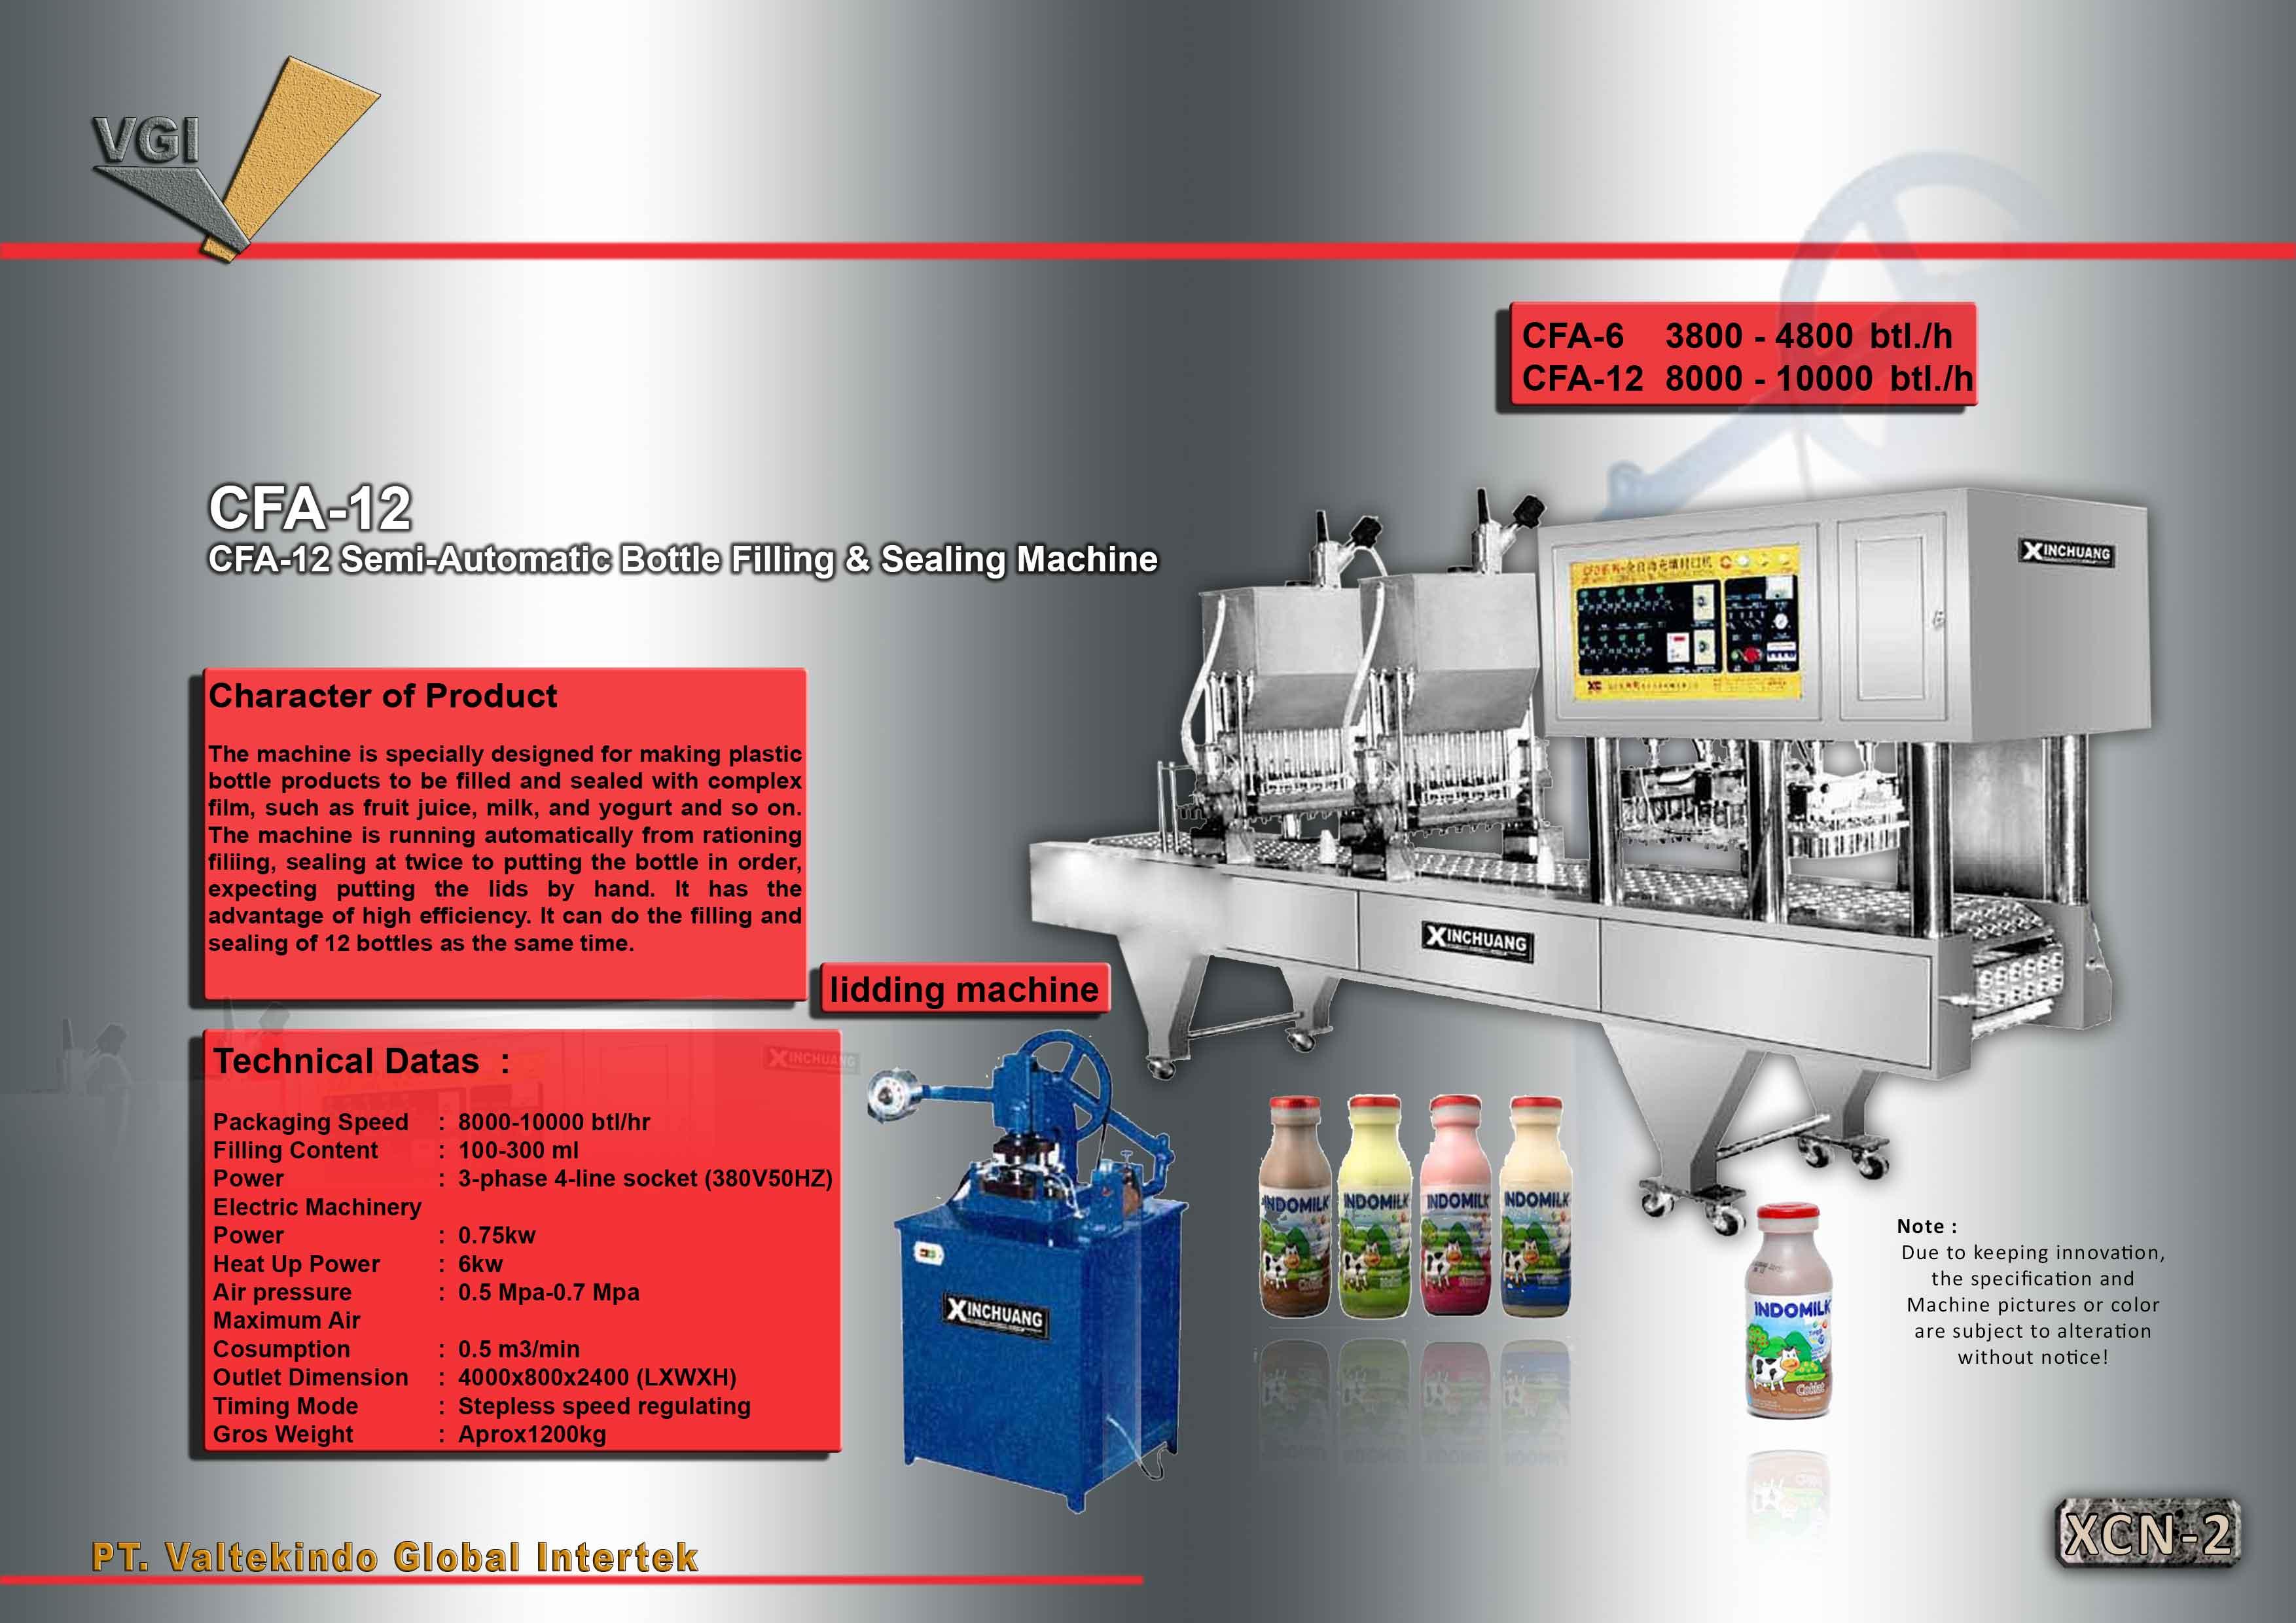 jual mesin Automatic Bottle Filling & sealing Machine2 Automatic Bottle Filling & sealing Machine2